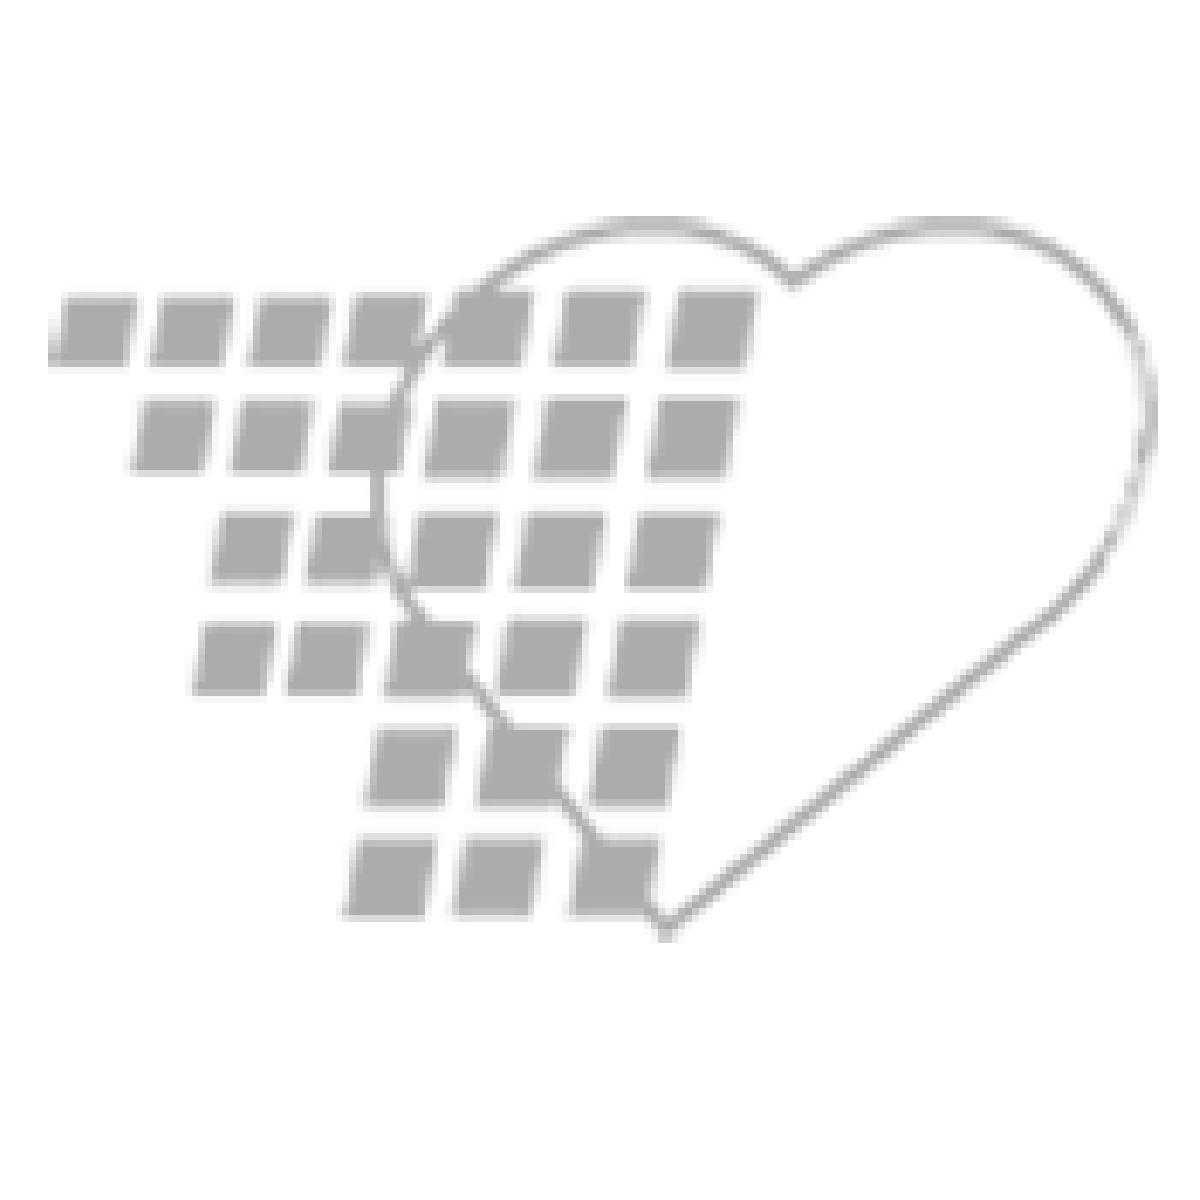 02-24-0850 - Ivac/Alaris Oral Temperature Porbe Covers